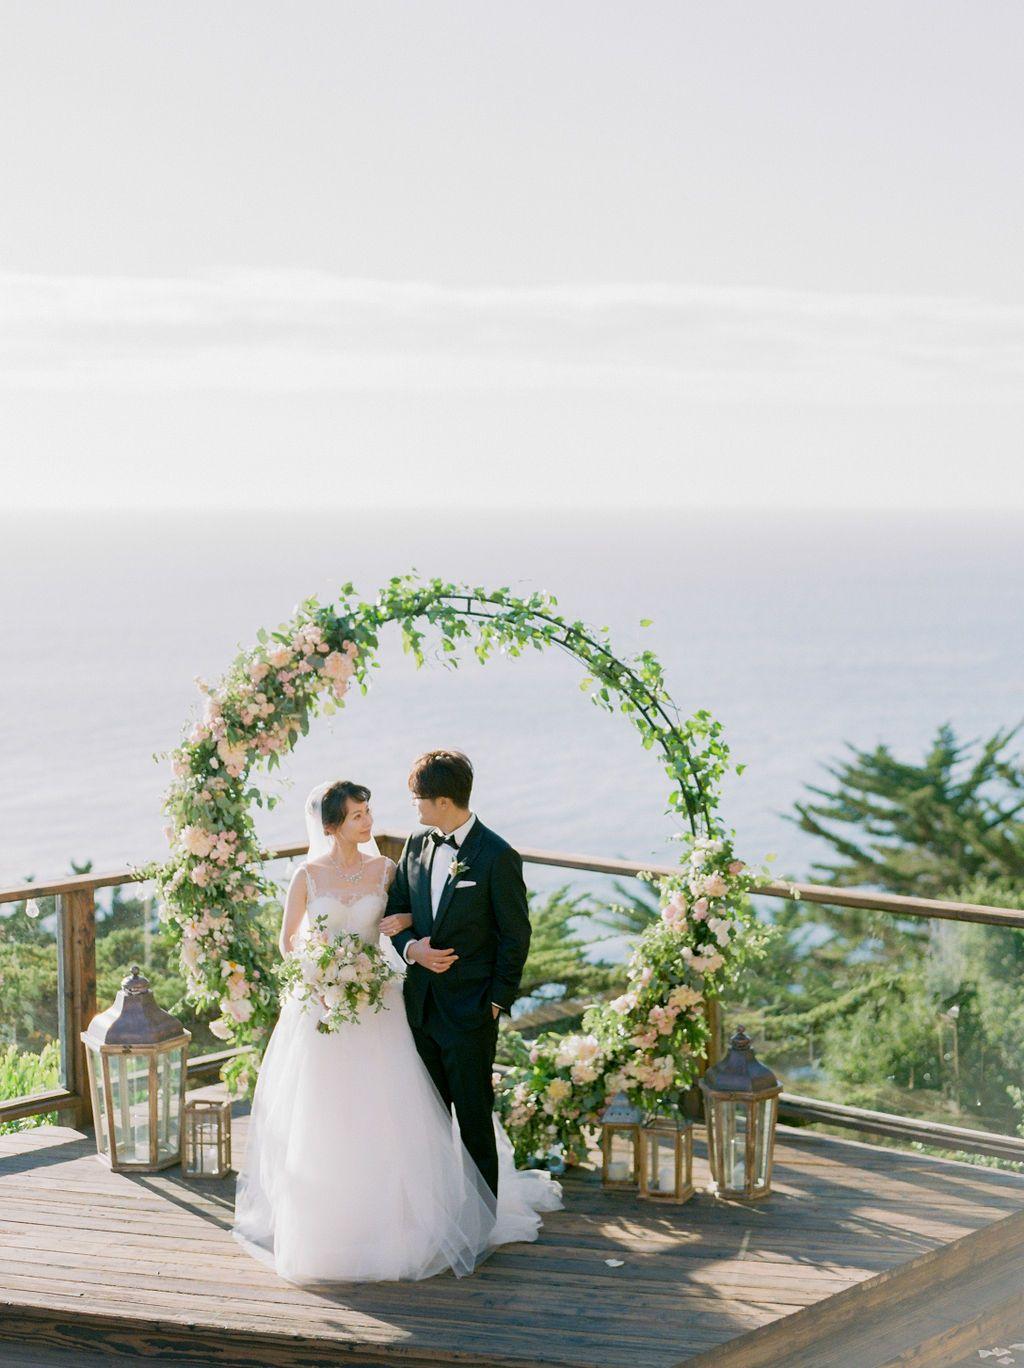 Wedding Ceremony At Hyatt Carmel Highlands Event Planning Styling Design Manna Sun Events Photographer Stella Event Planning Wedding Ceremony Wedding